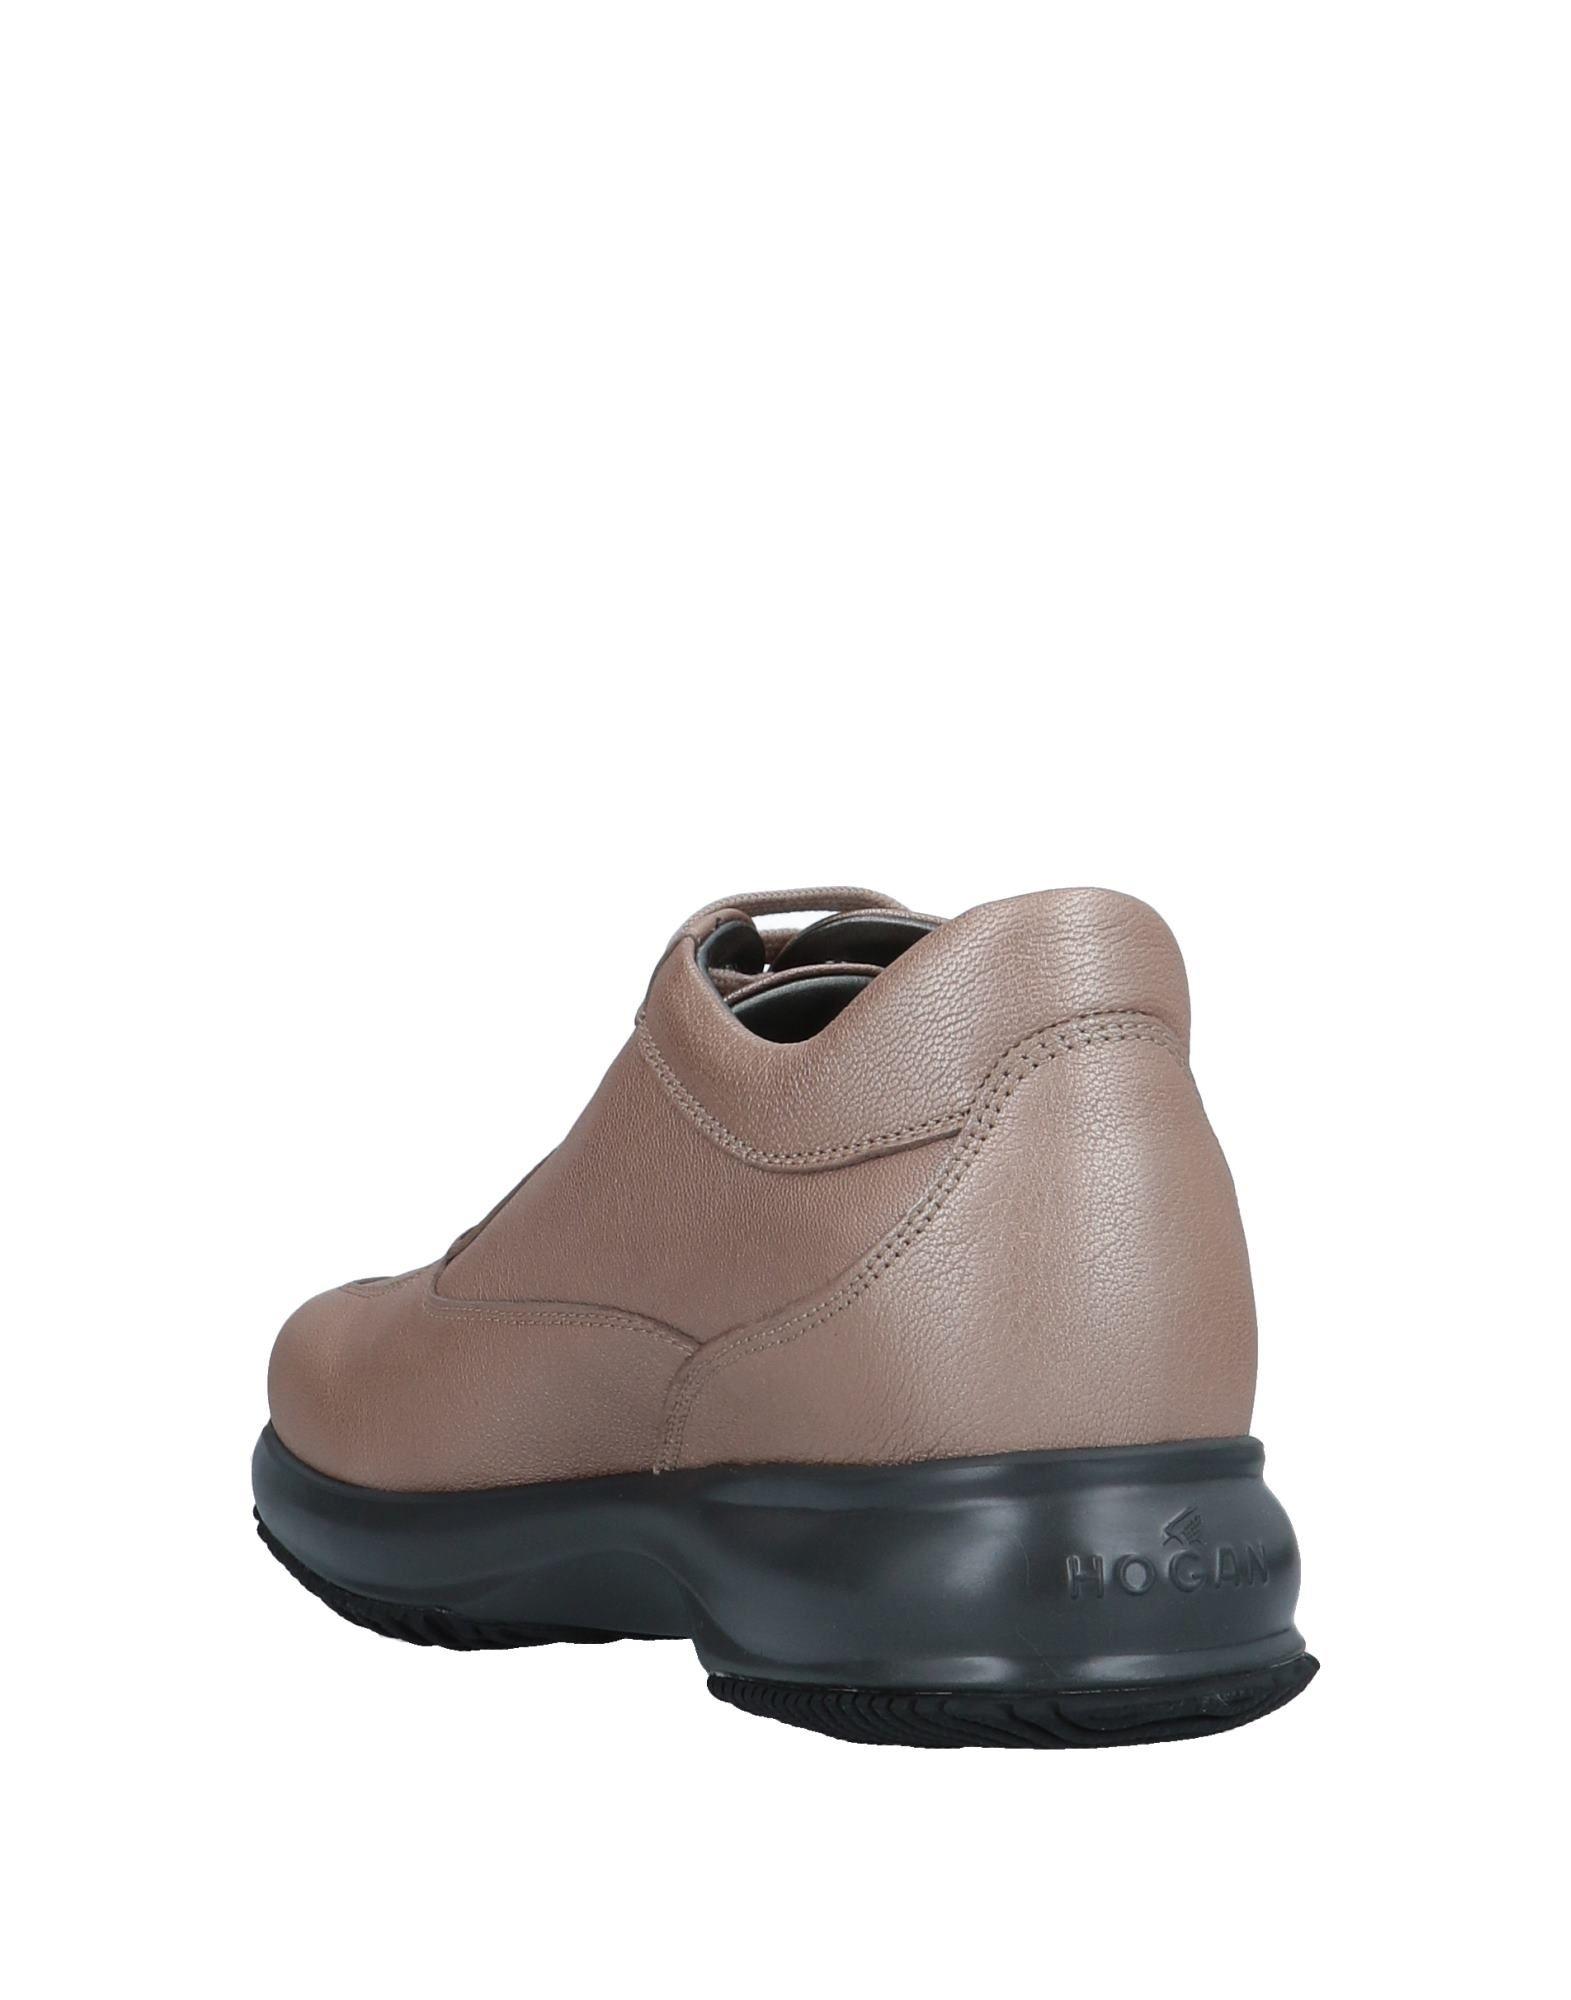 Hogan Hogan Hogan Sneakers - Women Hogan Sneakers online on  United Kingdom - 11567709JN cb1352